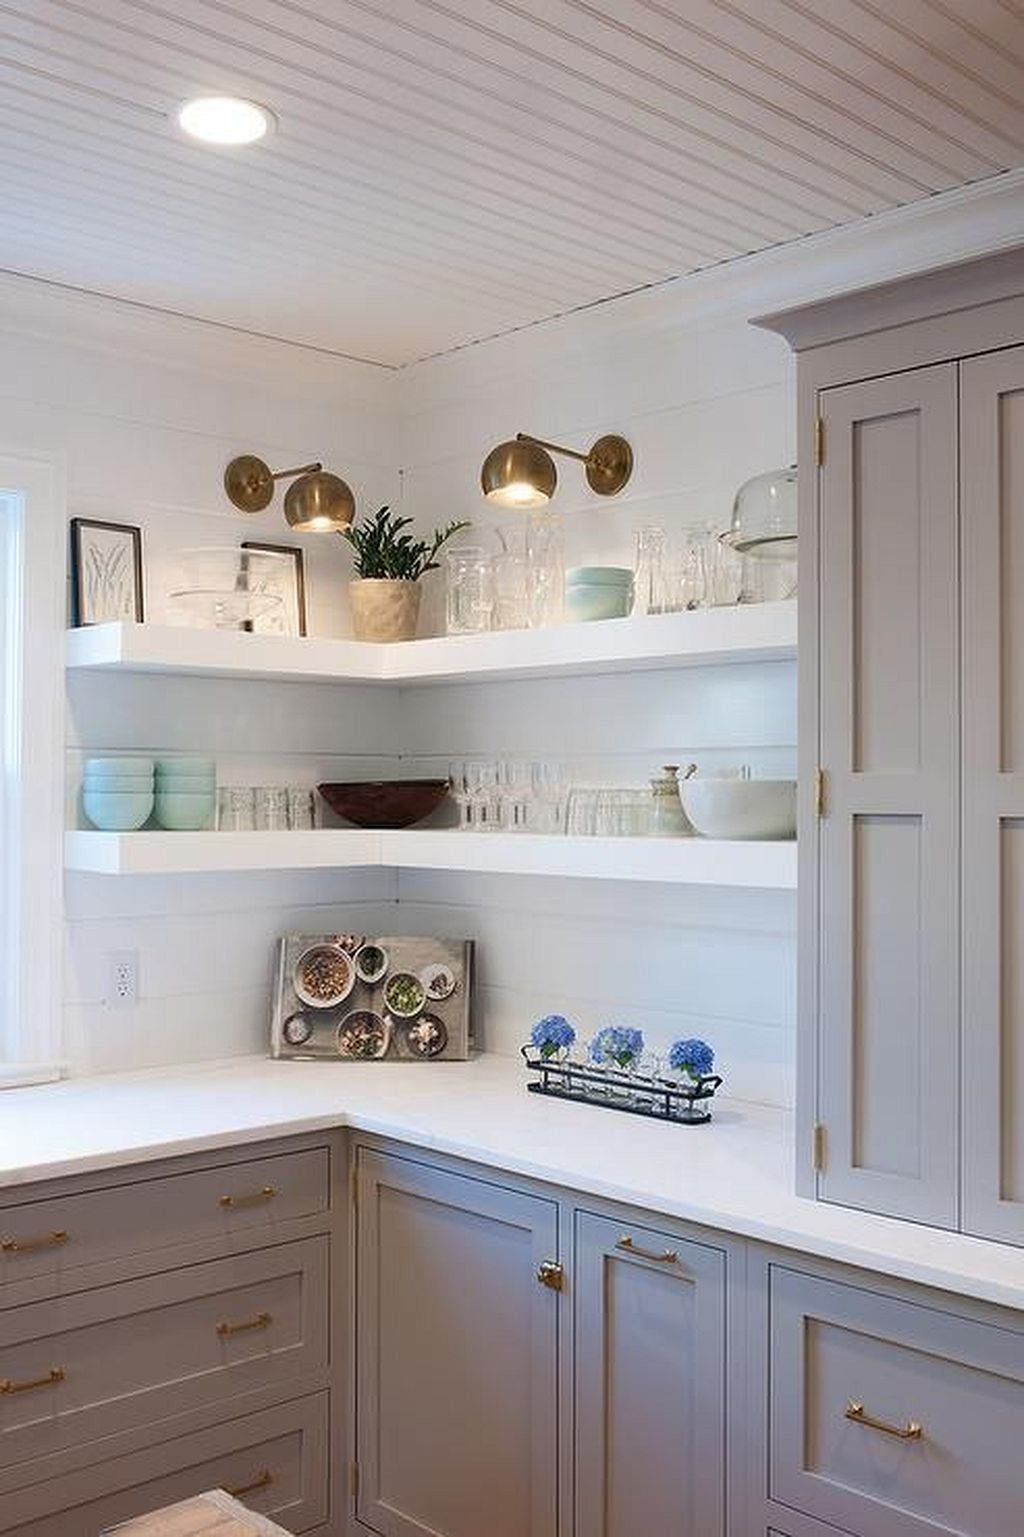 Pin By Carol Omer On Kitchen Ideas Diy Kitchen Shelves Grey